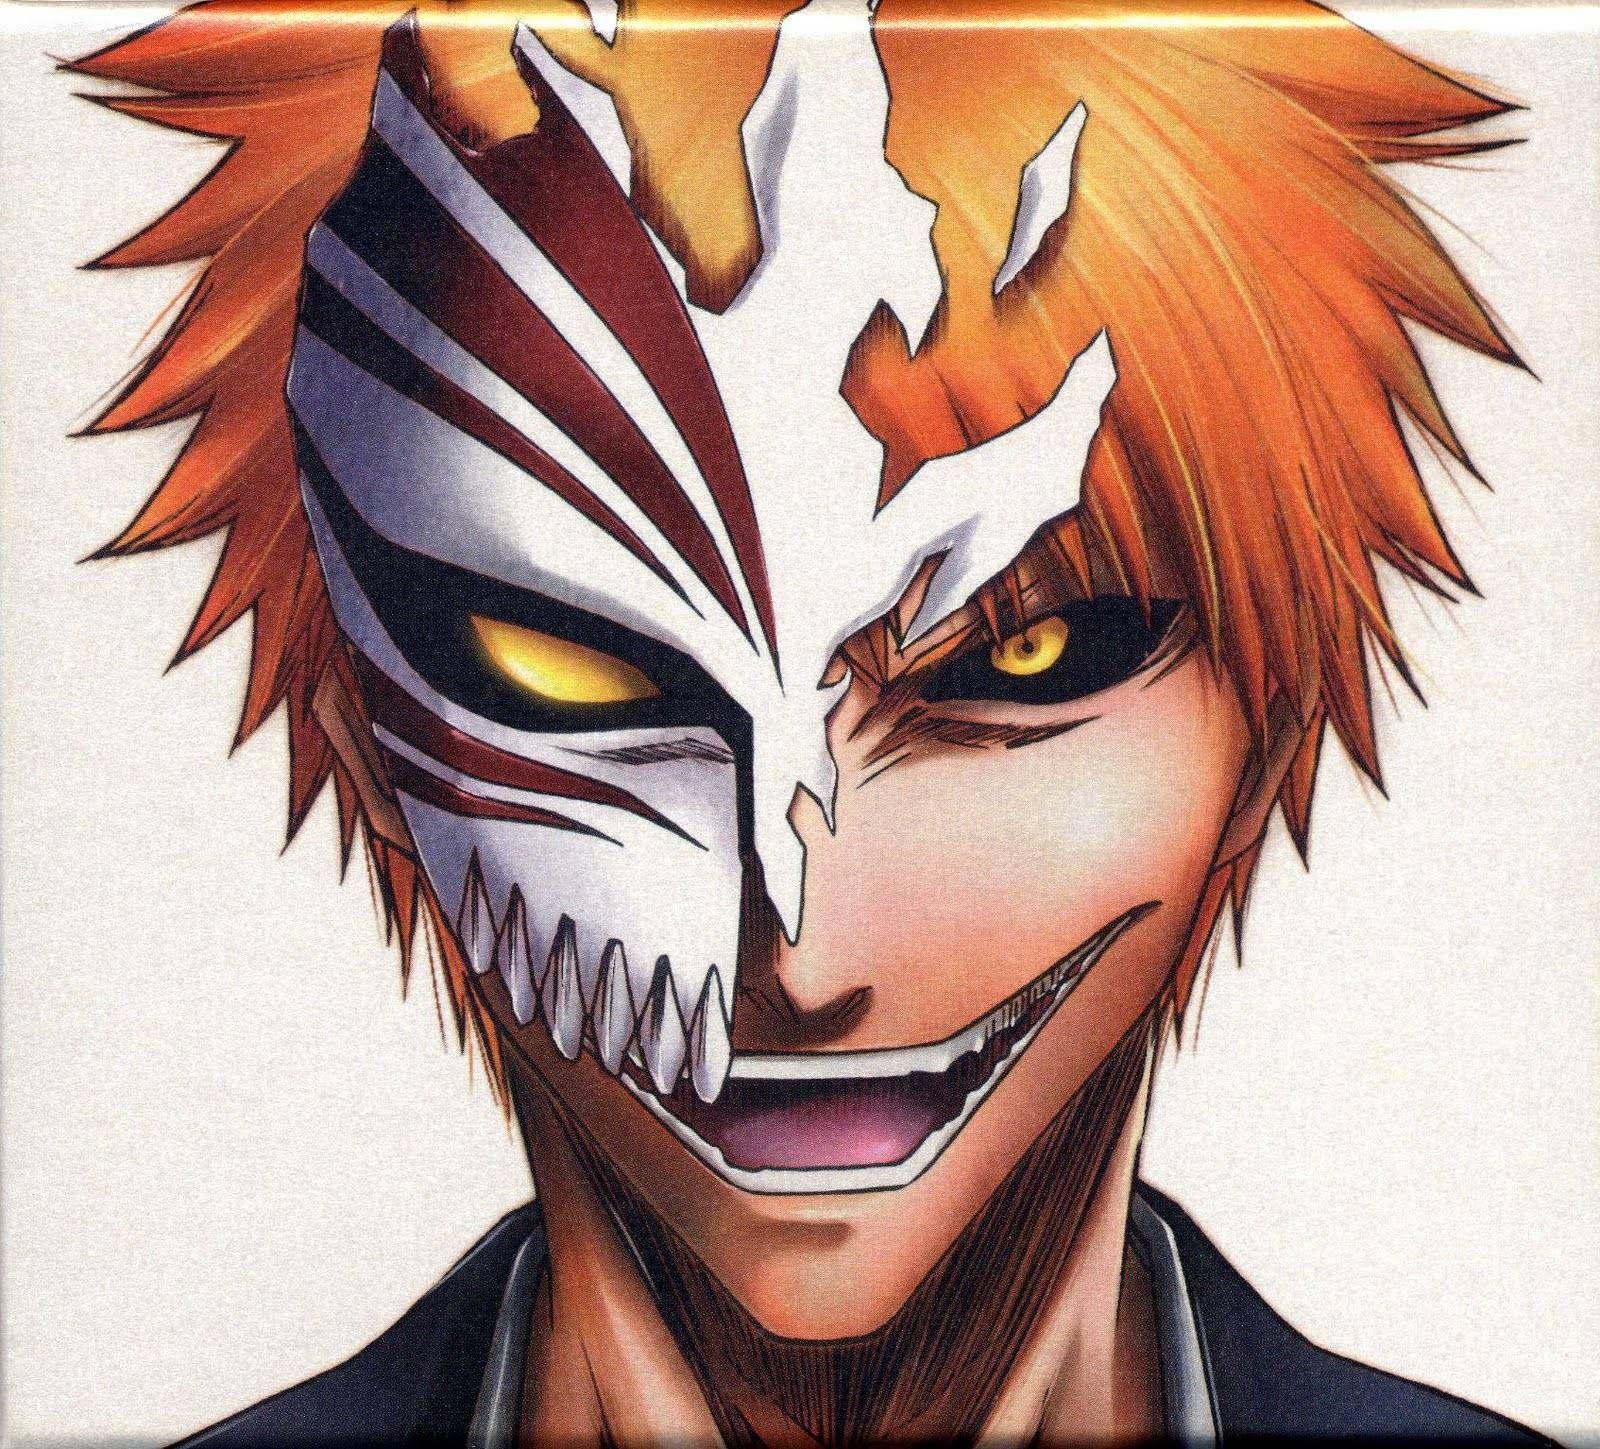 bleach anime ichigo Google Search Ichigo hollow mask